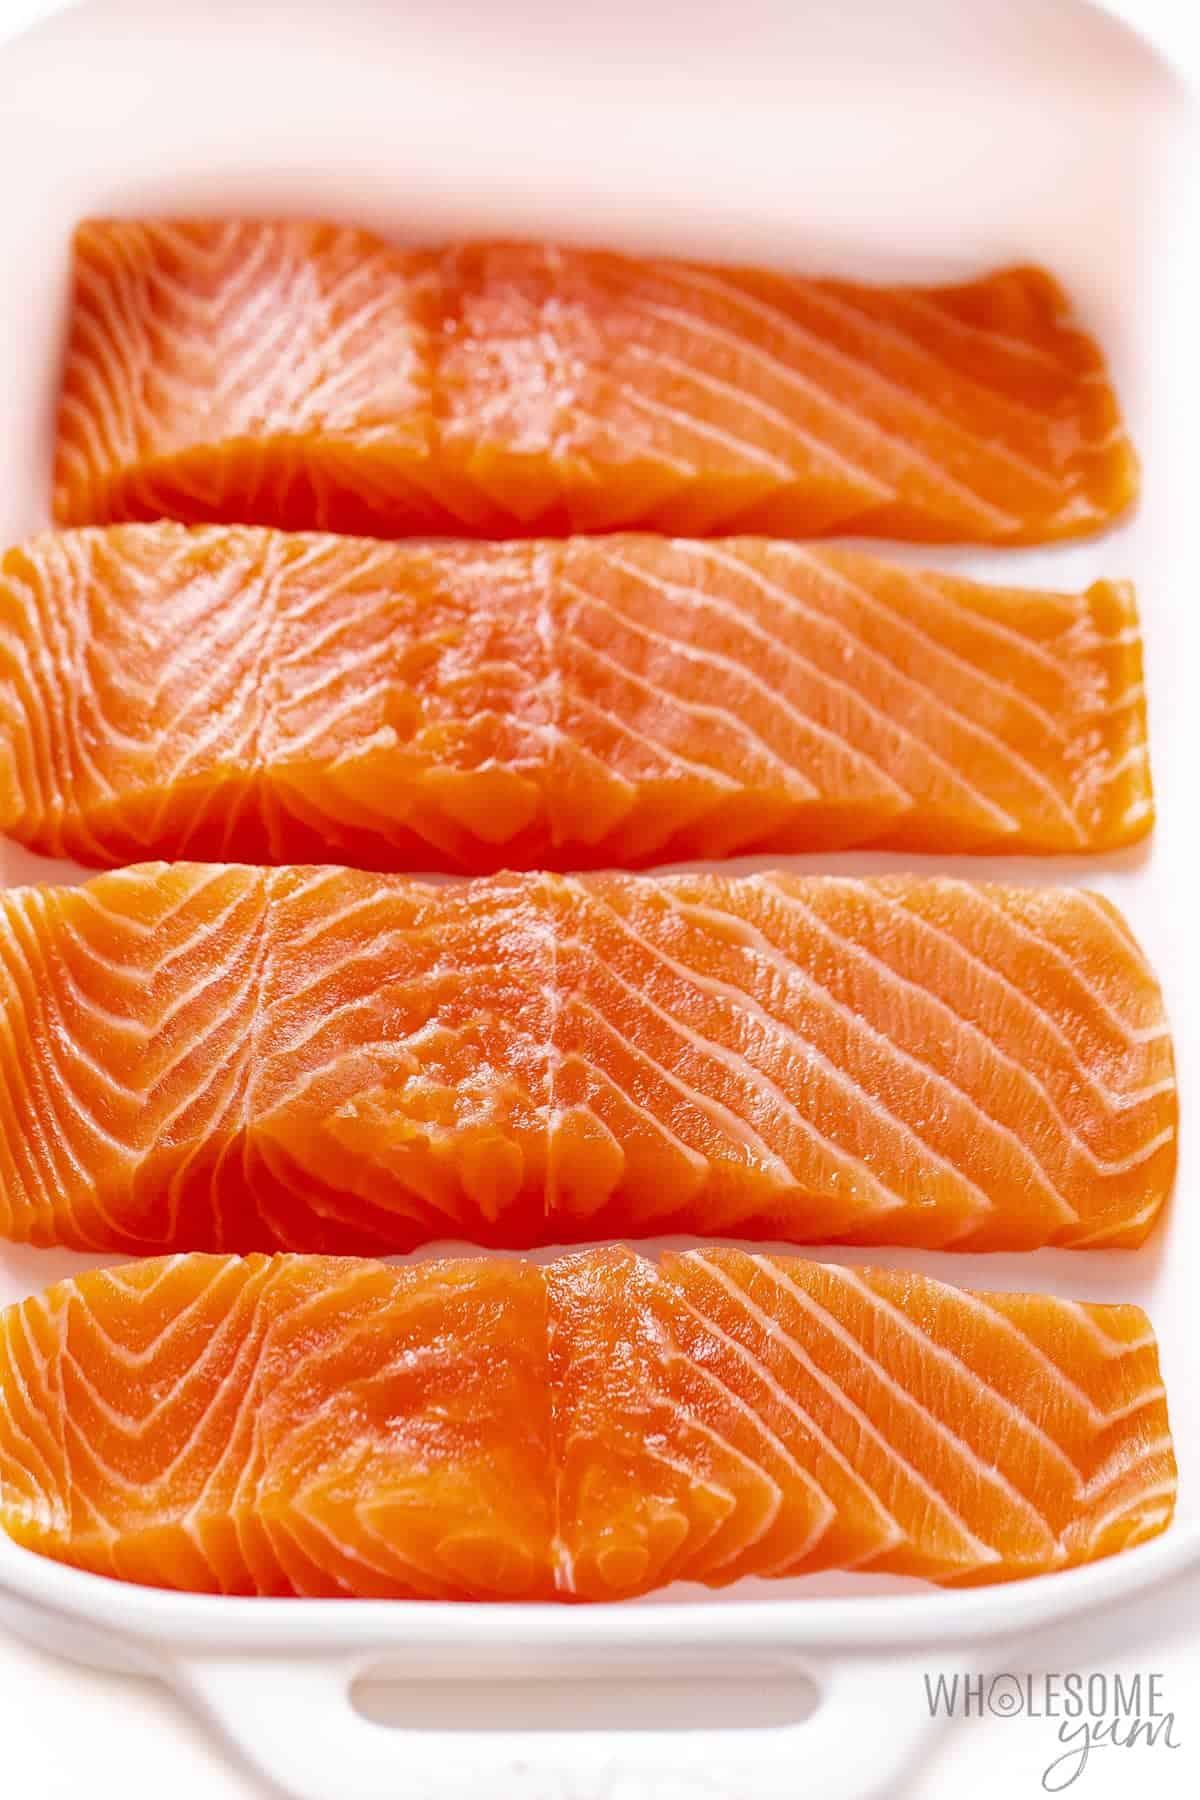 Is salmon keto? This raw fresh salmon is naturally keto friendly.